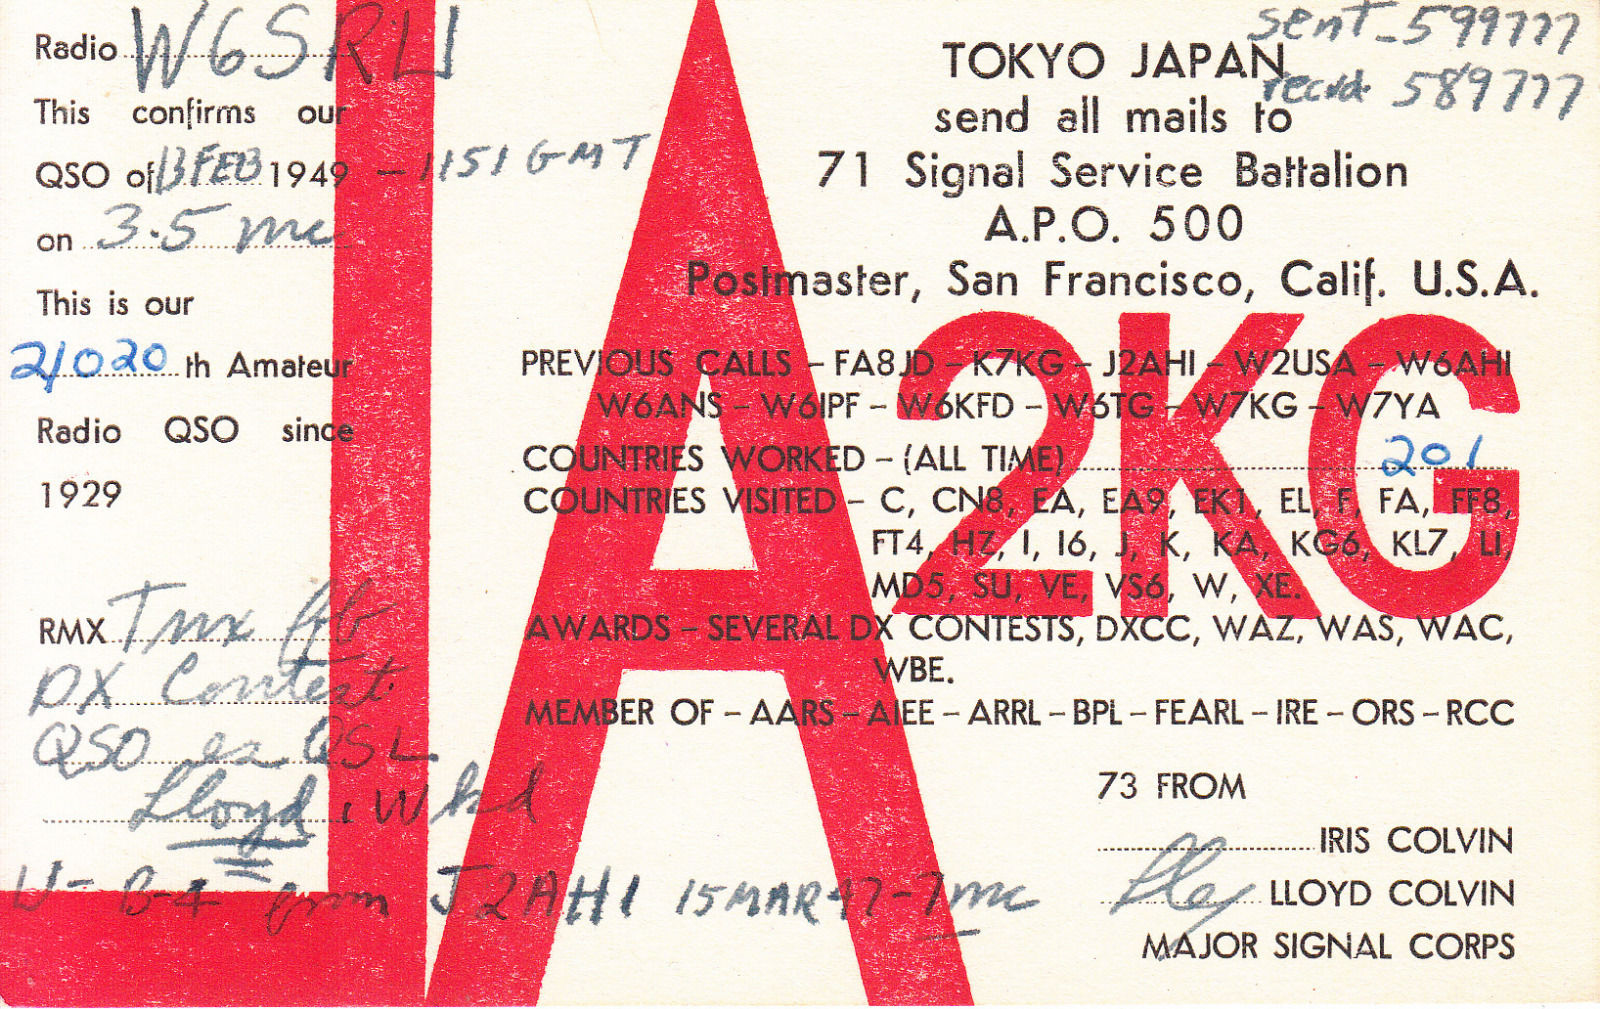 Нажмите на изображение для увеличения.  Название:9) ja2kg lloyd colvin 1947.jpg Просмотров:39 Размер:470.6 Кб ID:169984